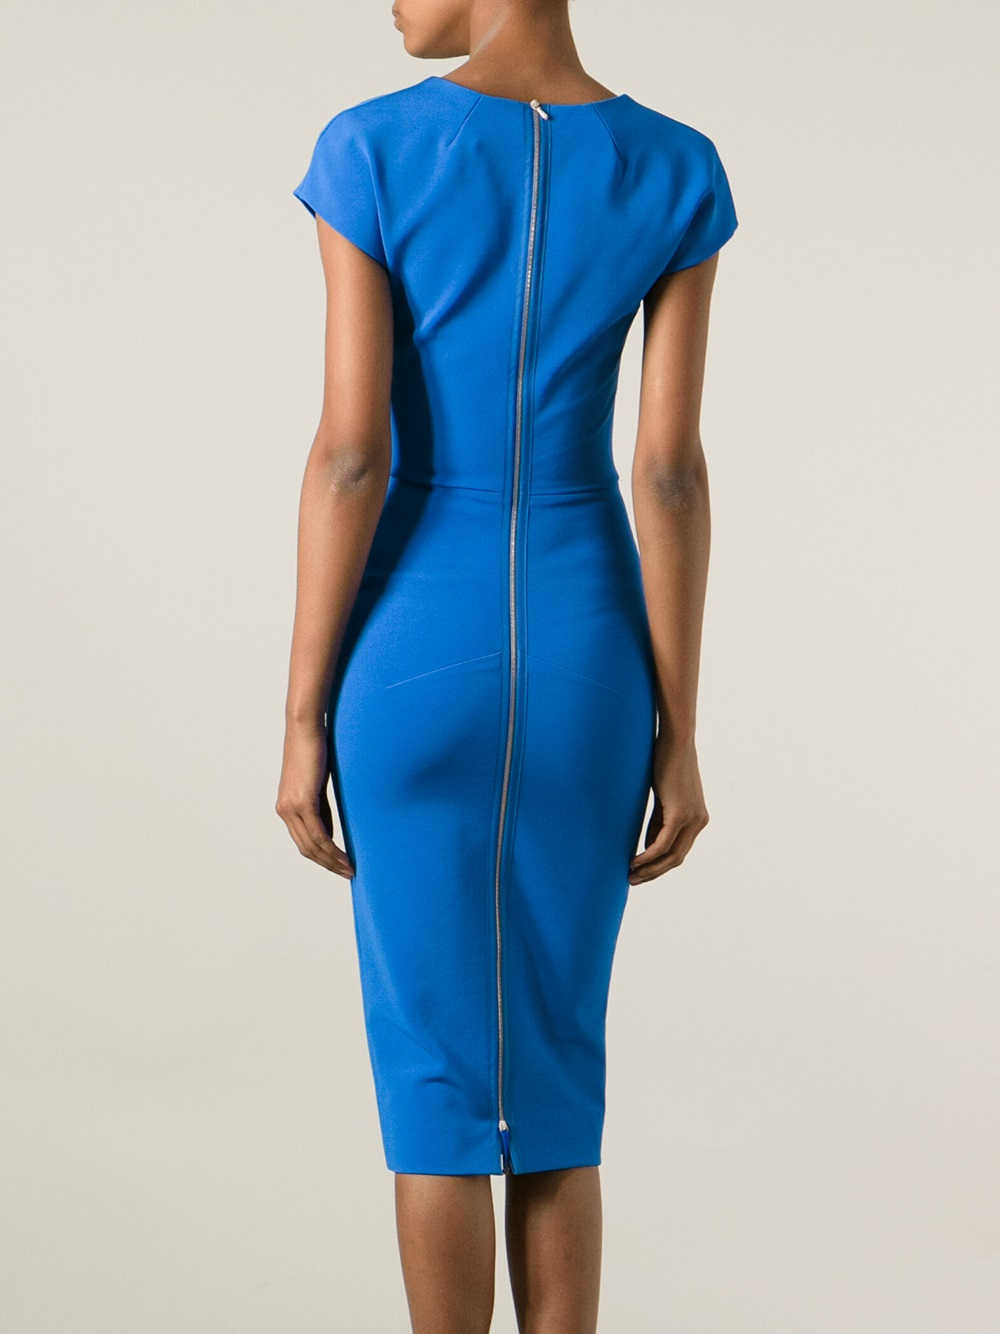 melange fitted dress - Blue Victoria Beckham P96a016fga